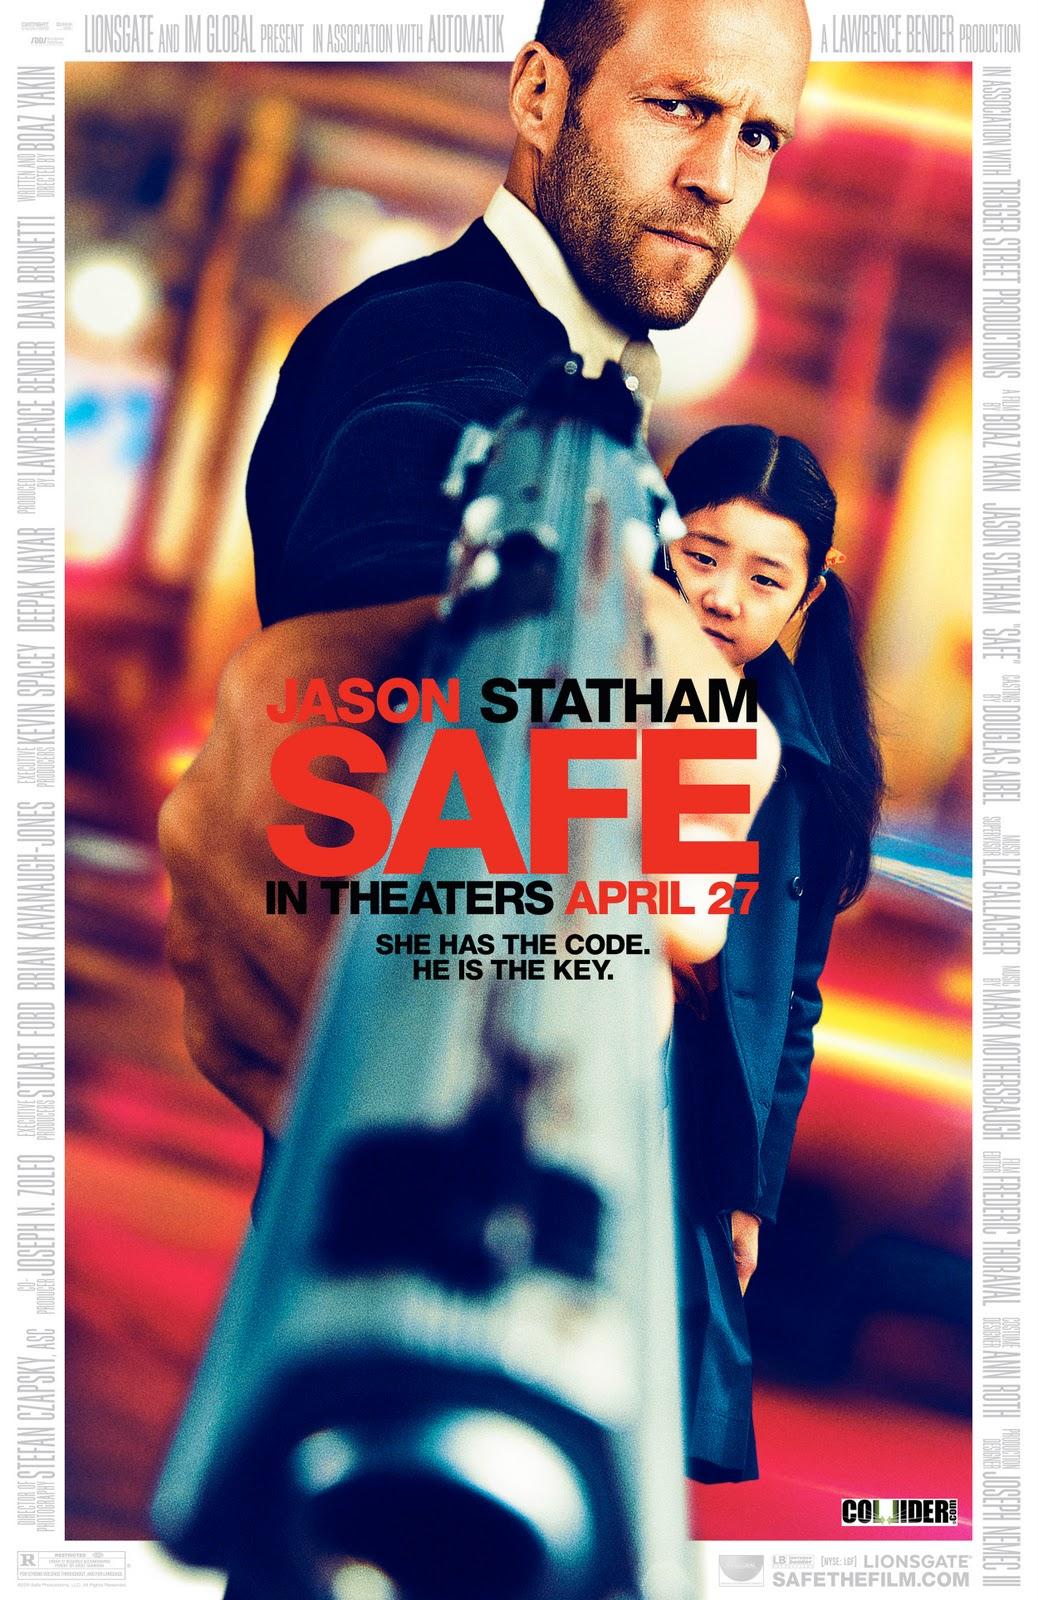 http://2.bp.blogspot.com/-sI0ruVGaaVE/Txc7N3kTSeI/AAAAAAAAKlI/b9MZDGM36Qw/s1600/Safe-movie-poster-Jason-Statham.jpg